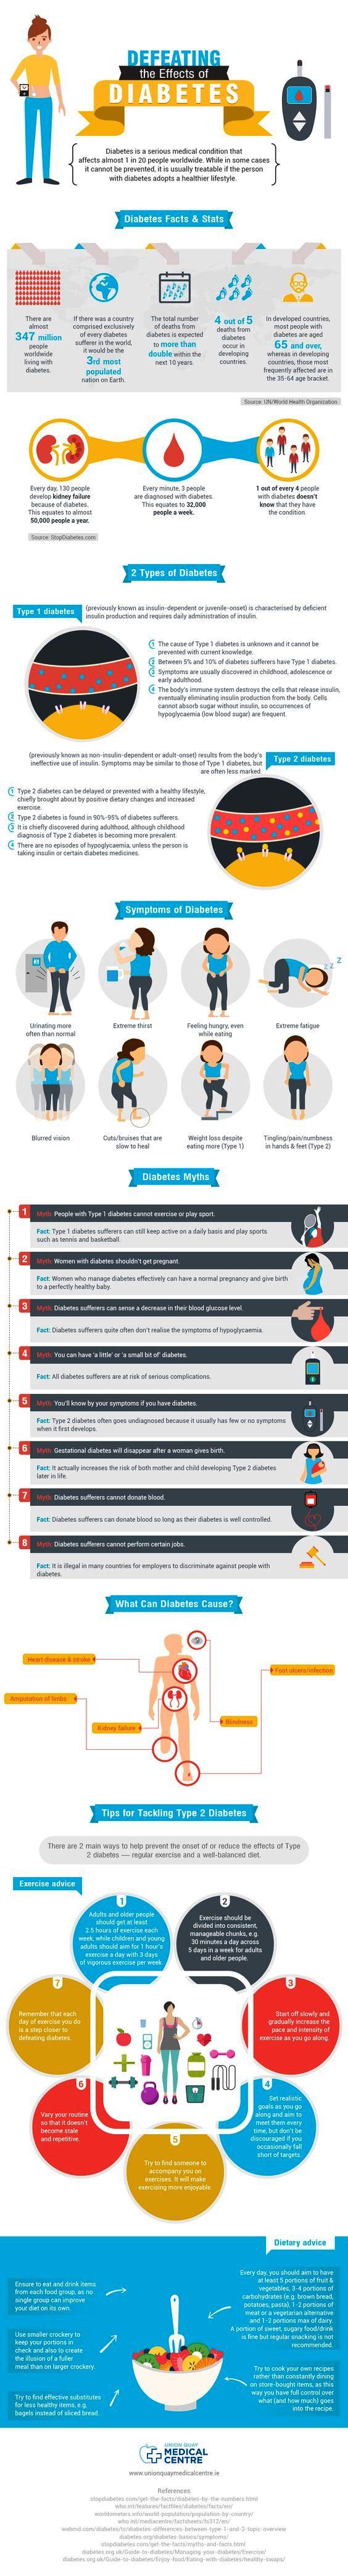 Infographic on Diabetes